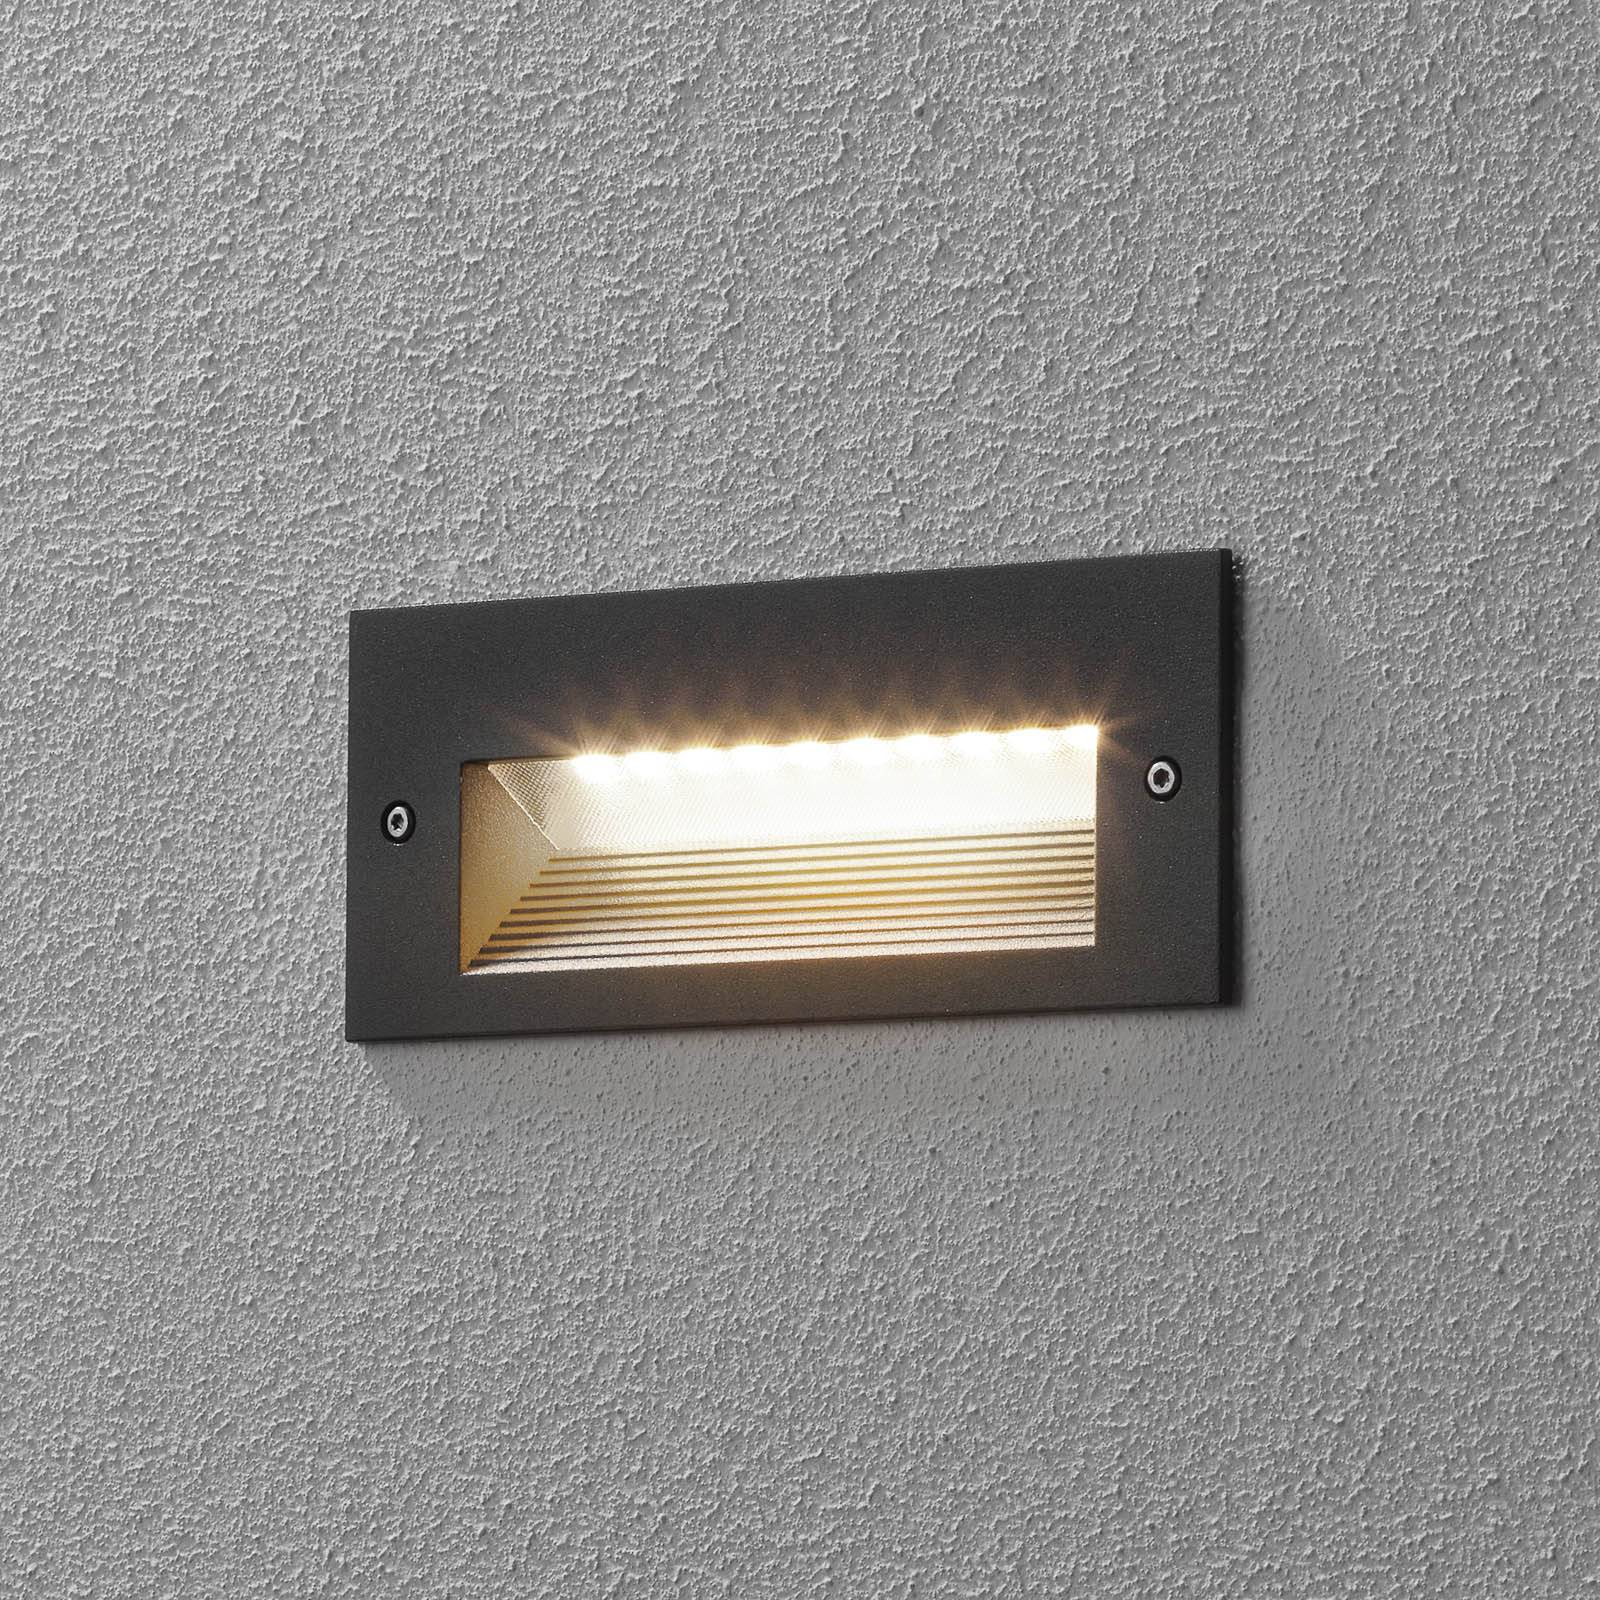 BEGA 33053 applique LED 3000K graphite 17cm